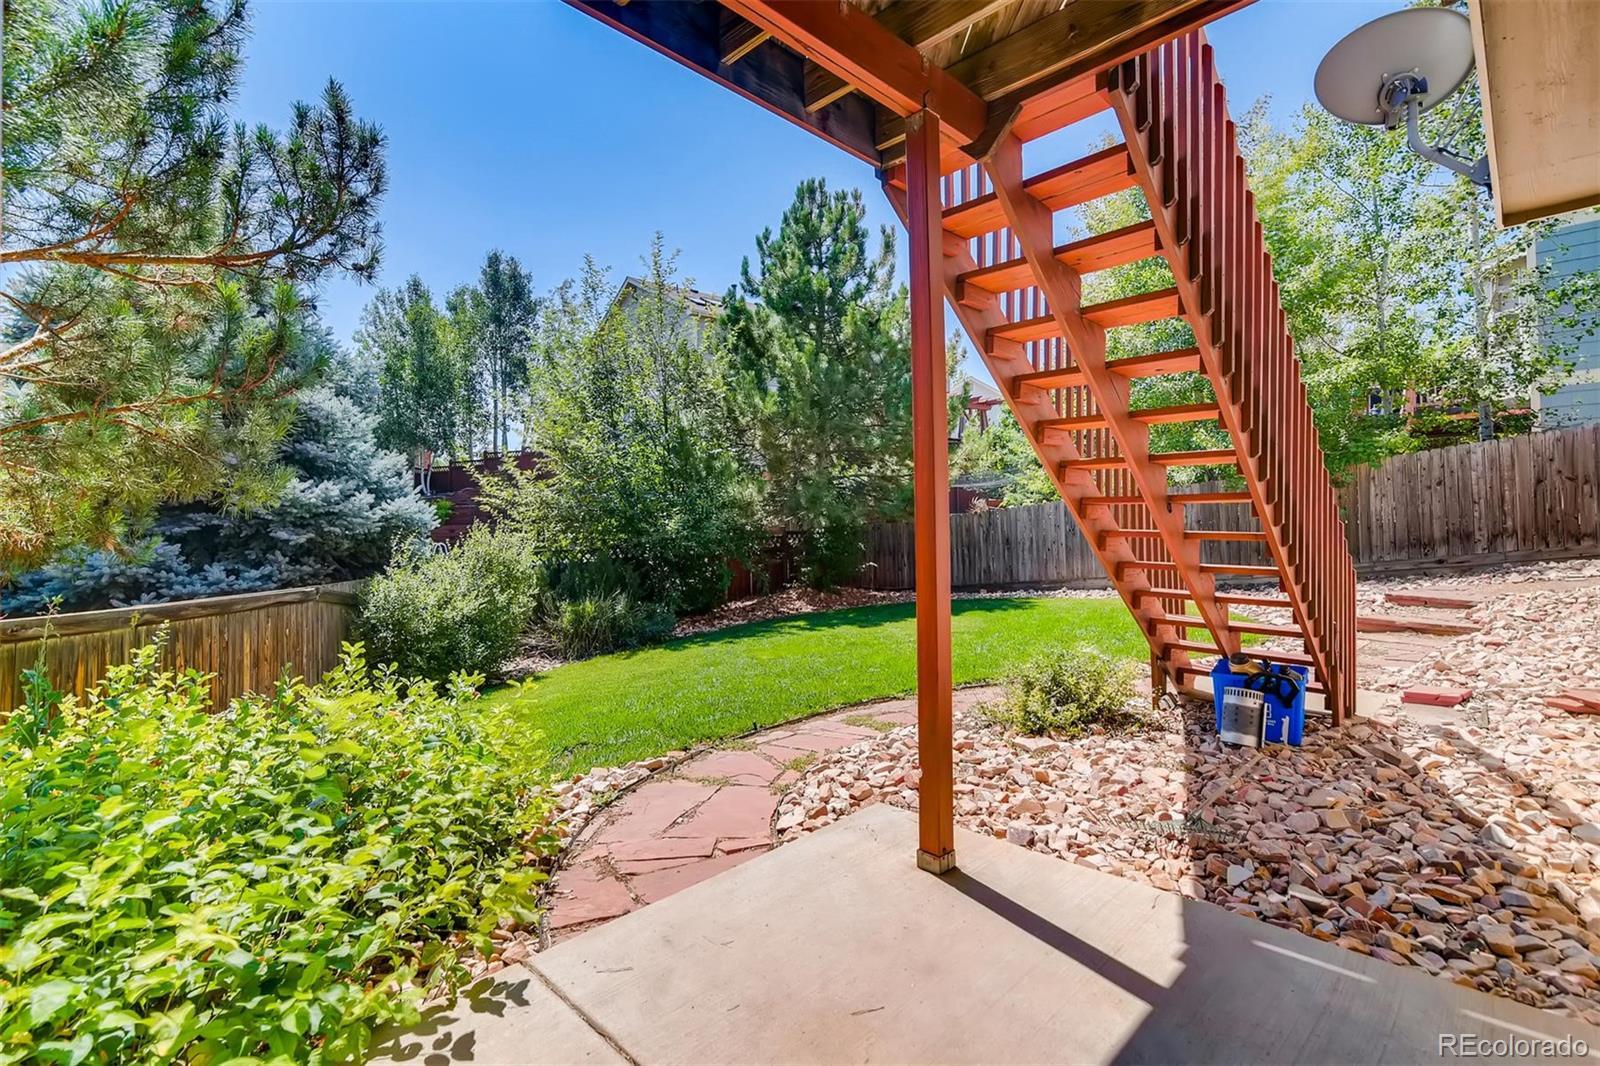 MLS# 9724731 - 28 - 498 Promontory Drive, Loveland, CO 80537